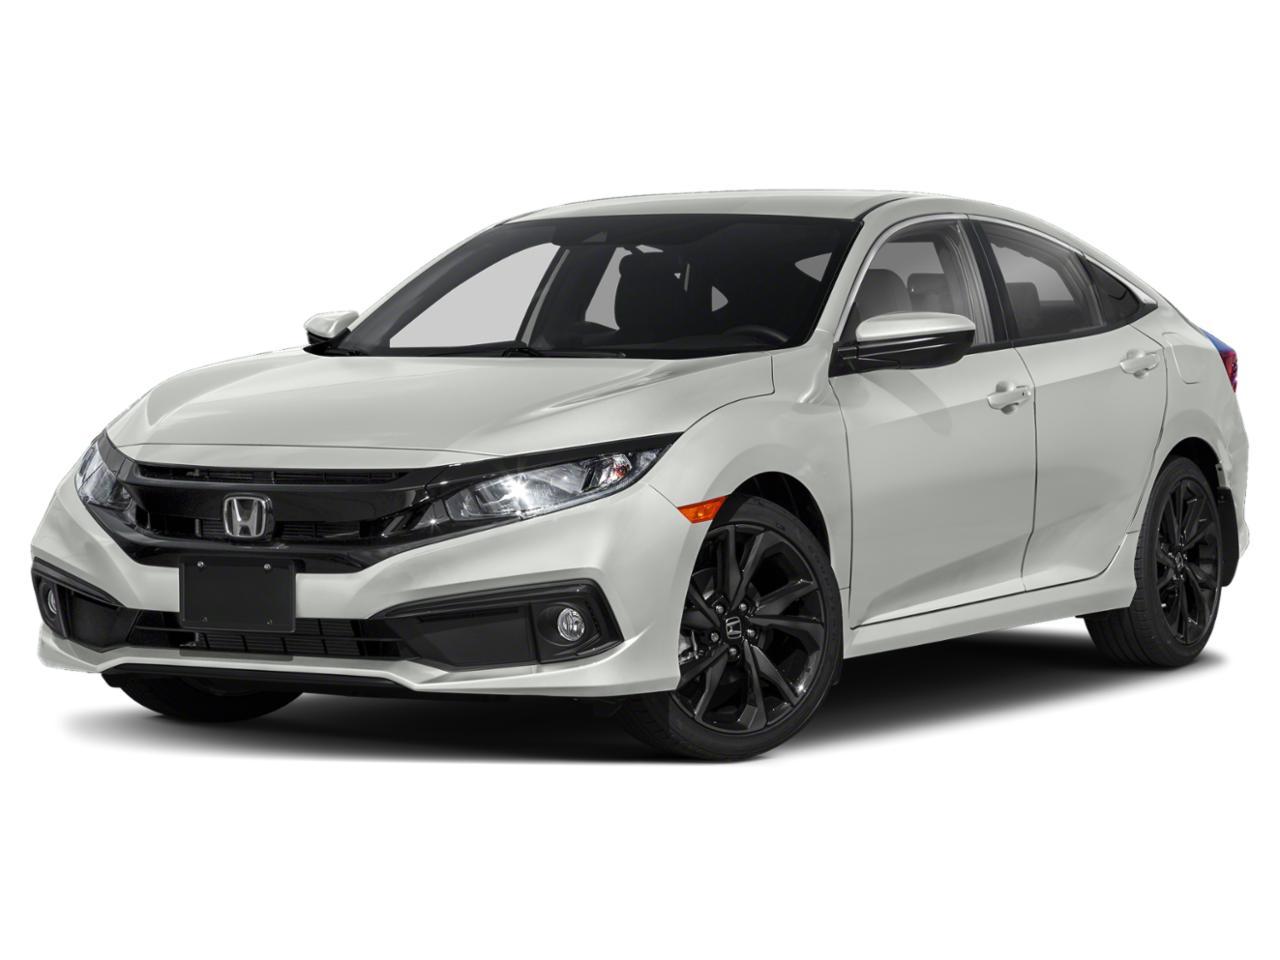 2020 Honda Civic Sedan Vehicle Photo in Pittsburg, CA 94565